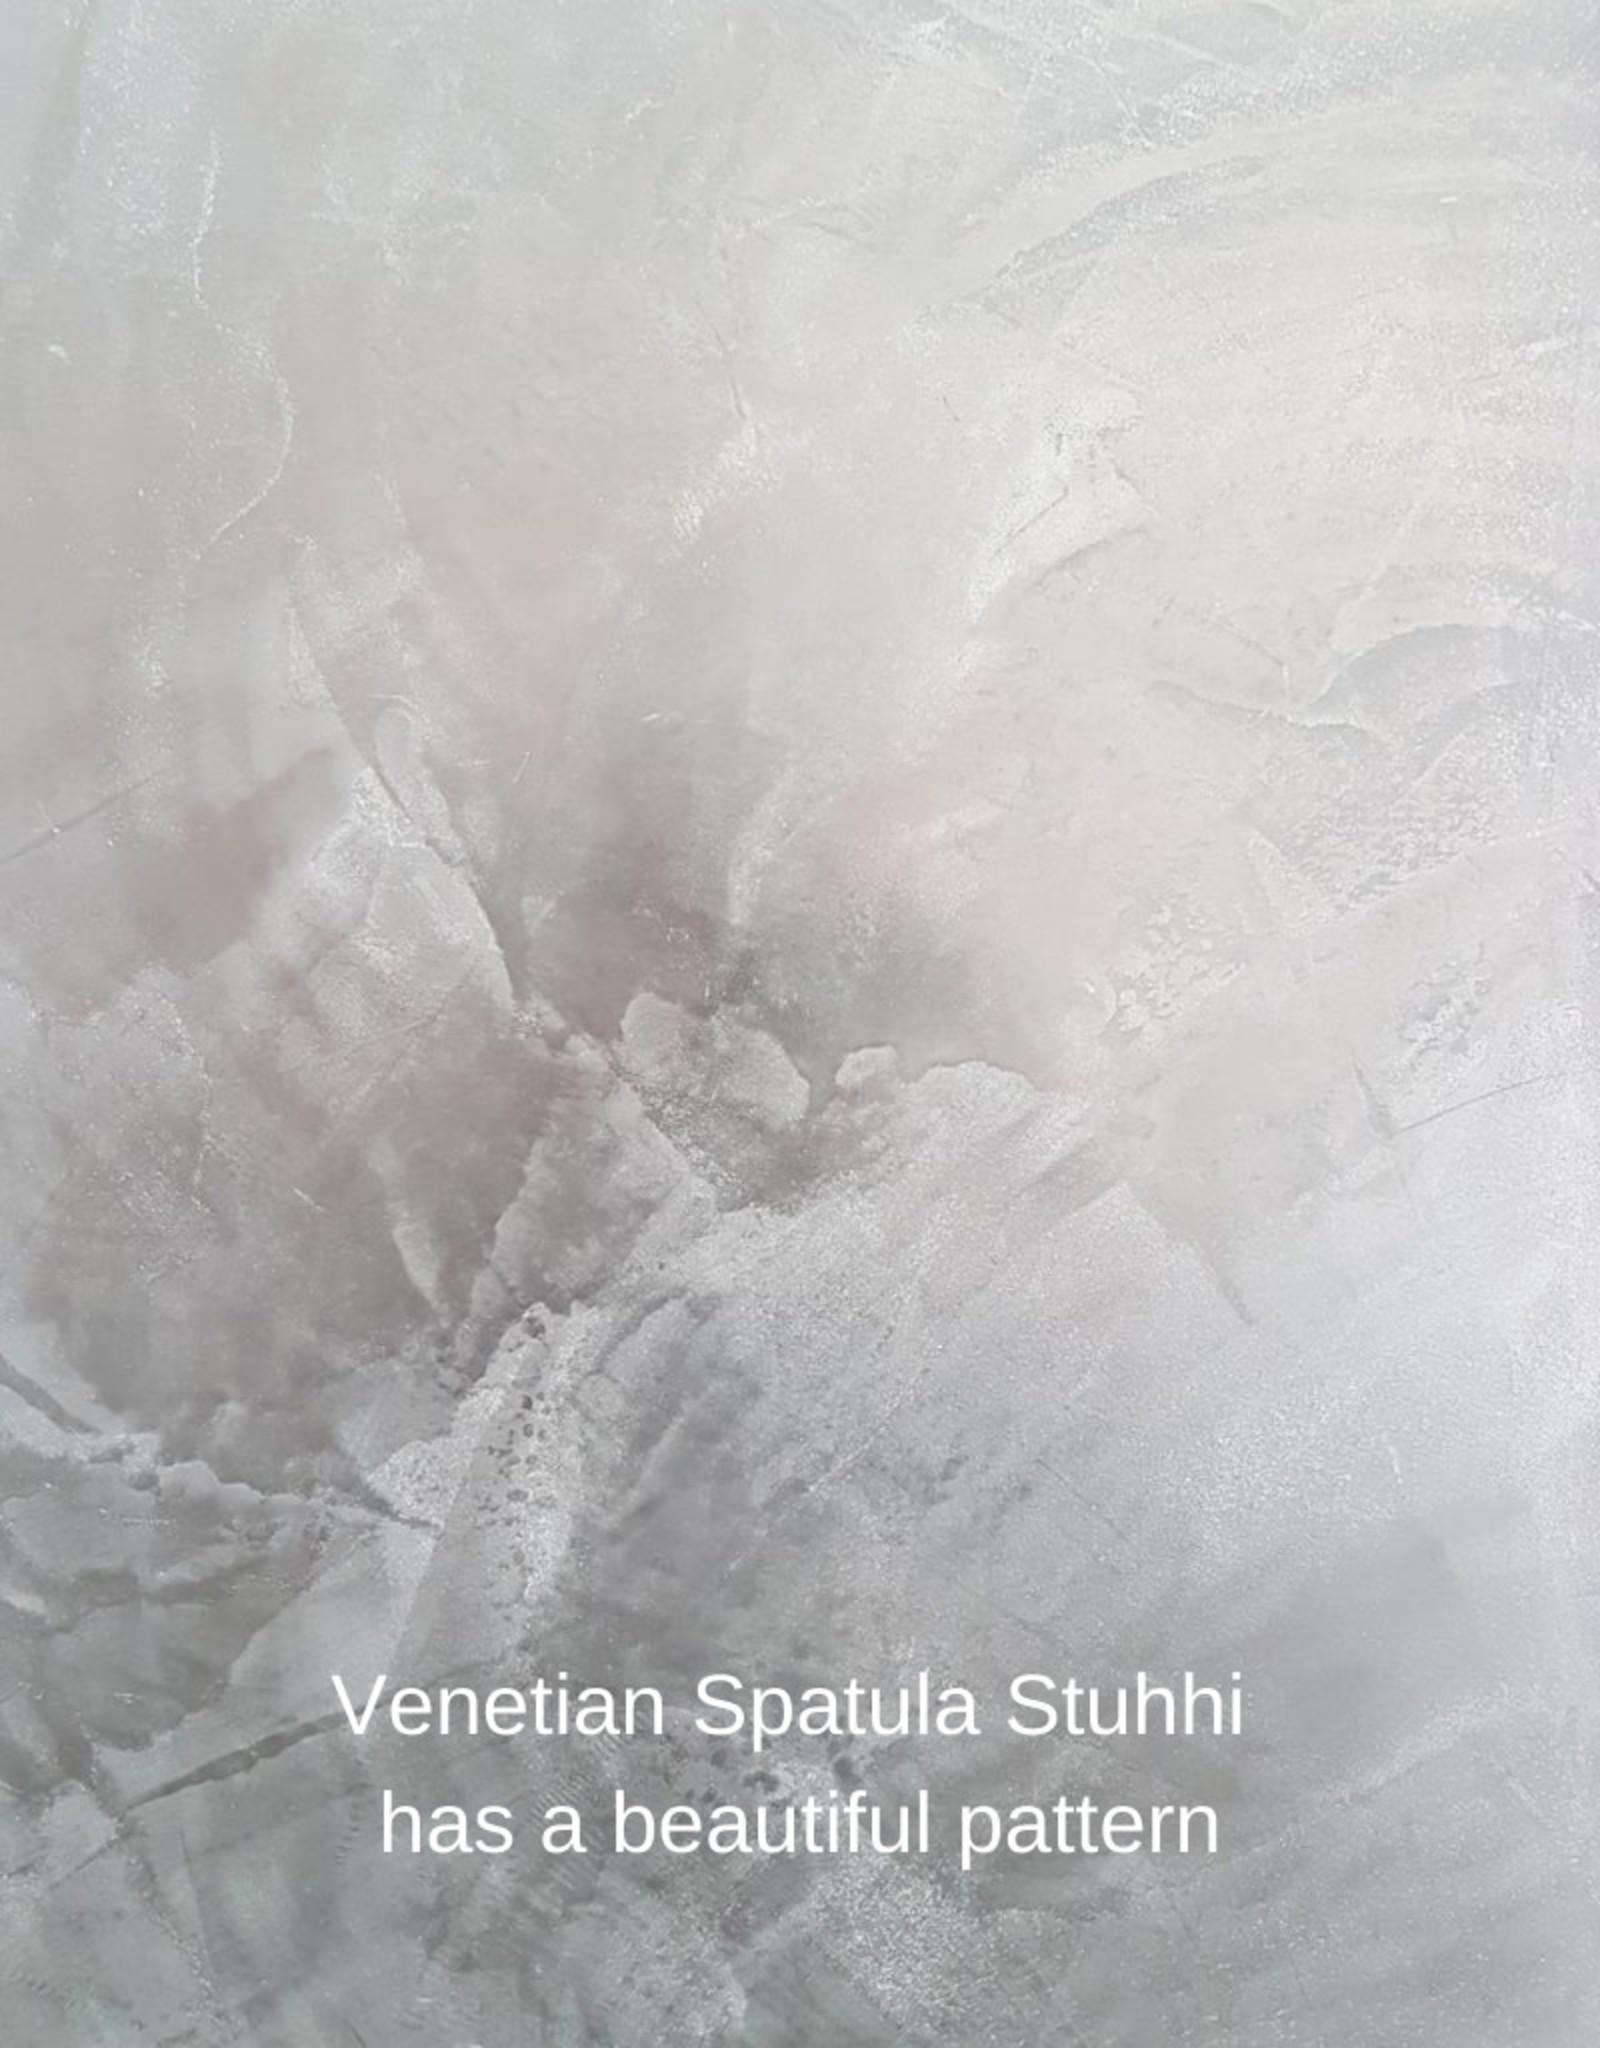 GIORGIO GRAESAN Venetian Plaster Spatula Stuhhi